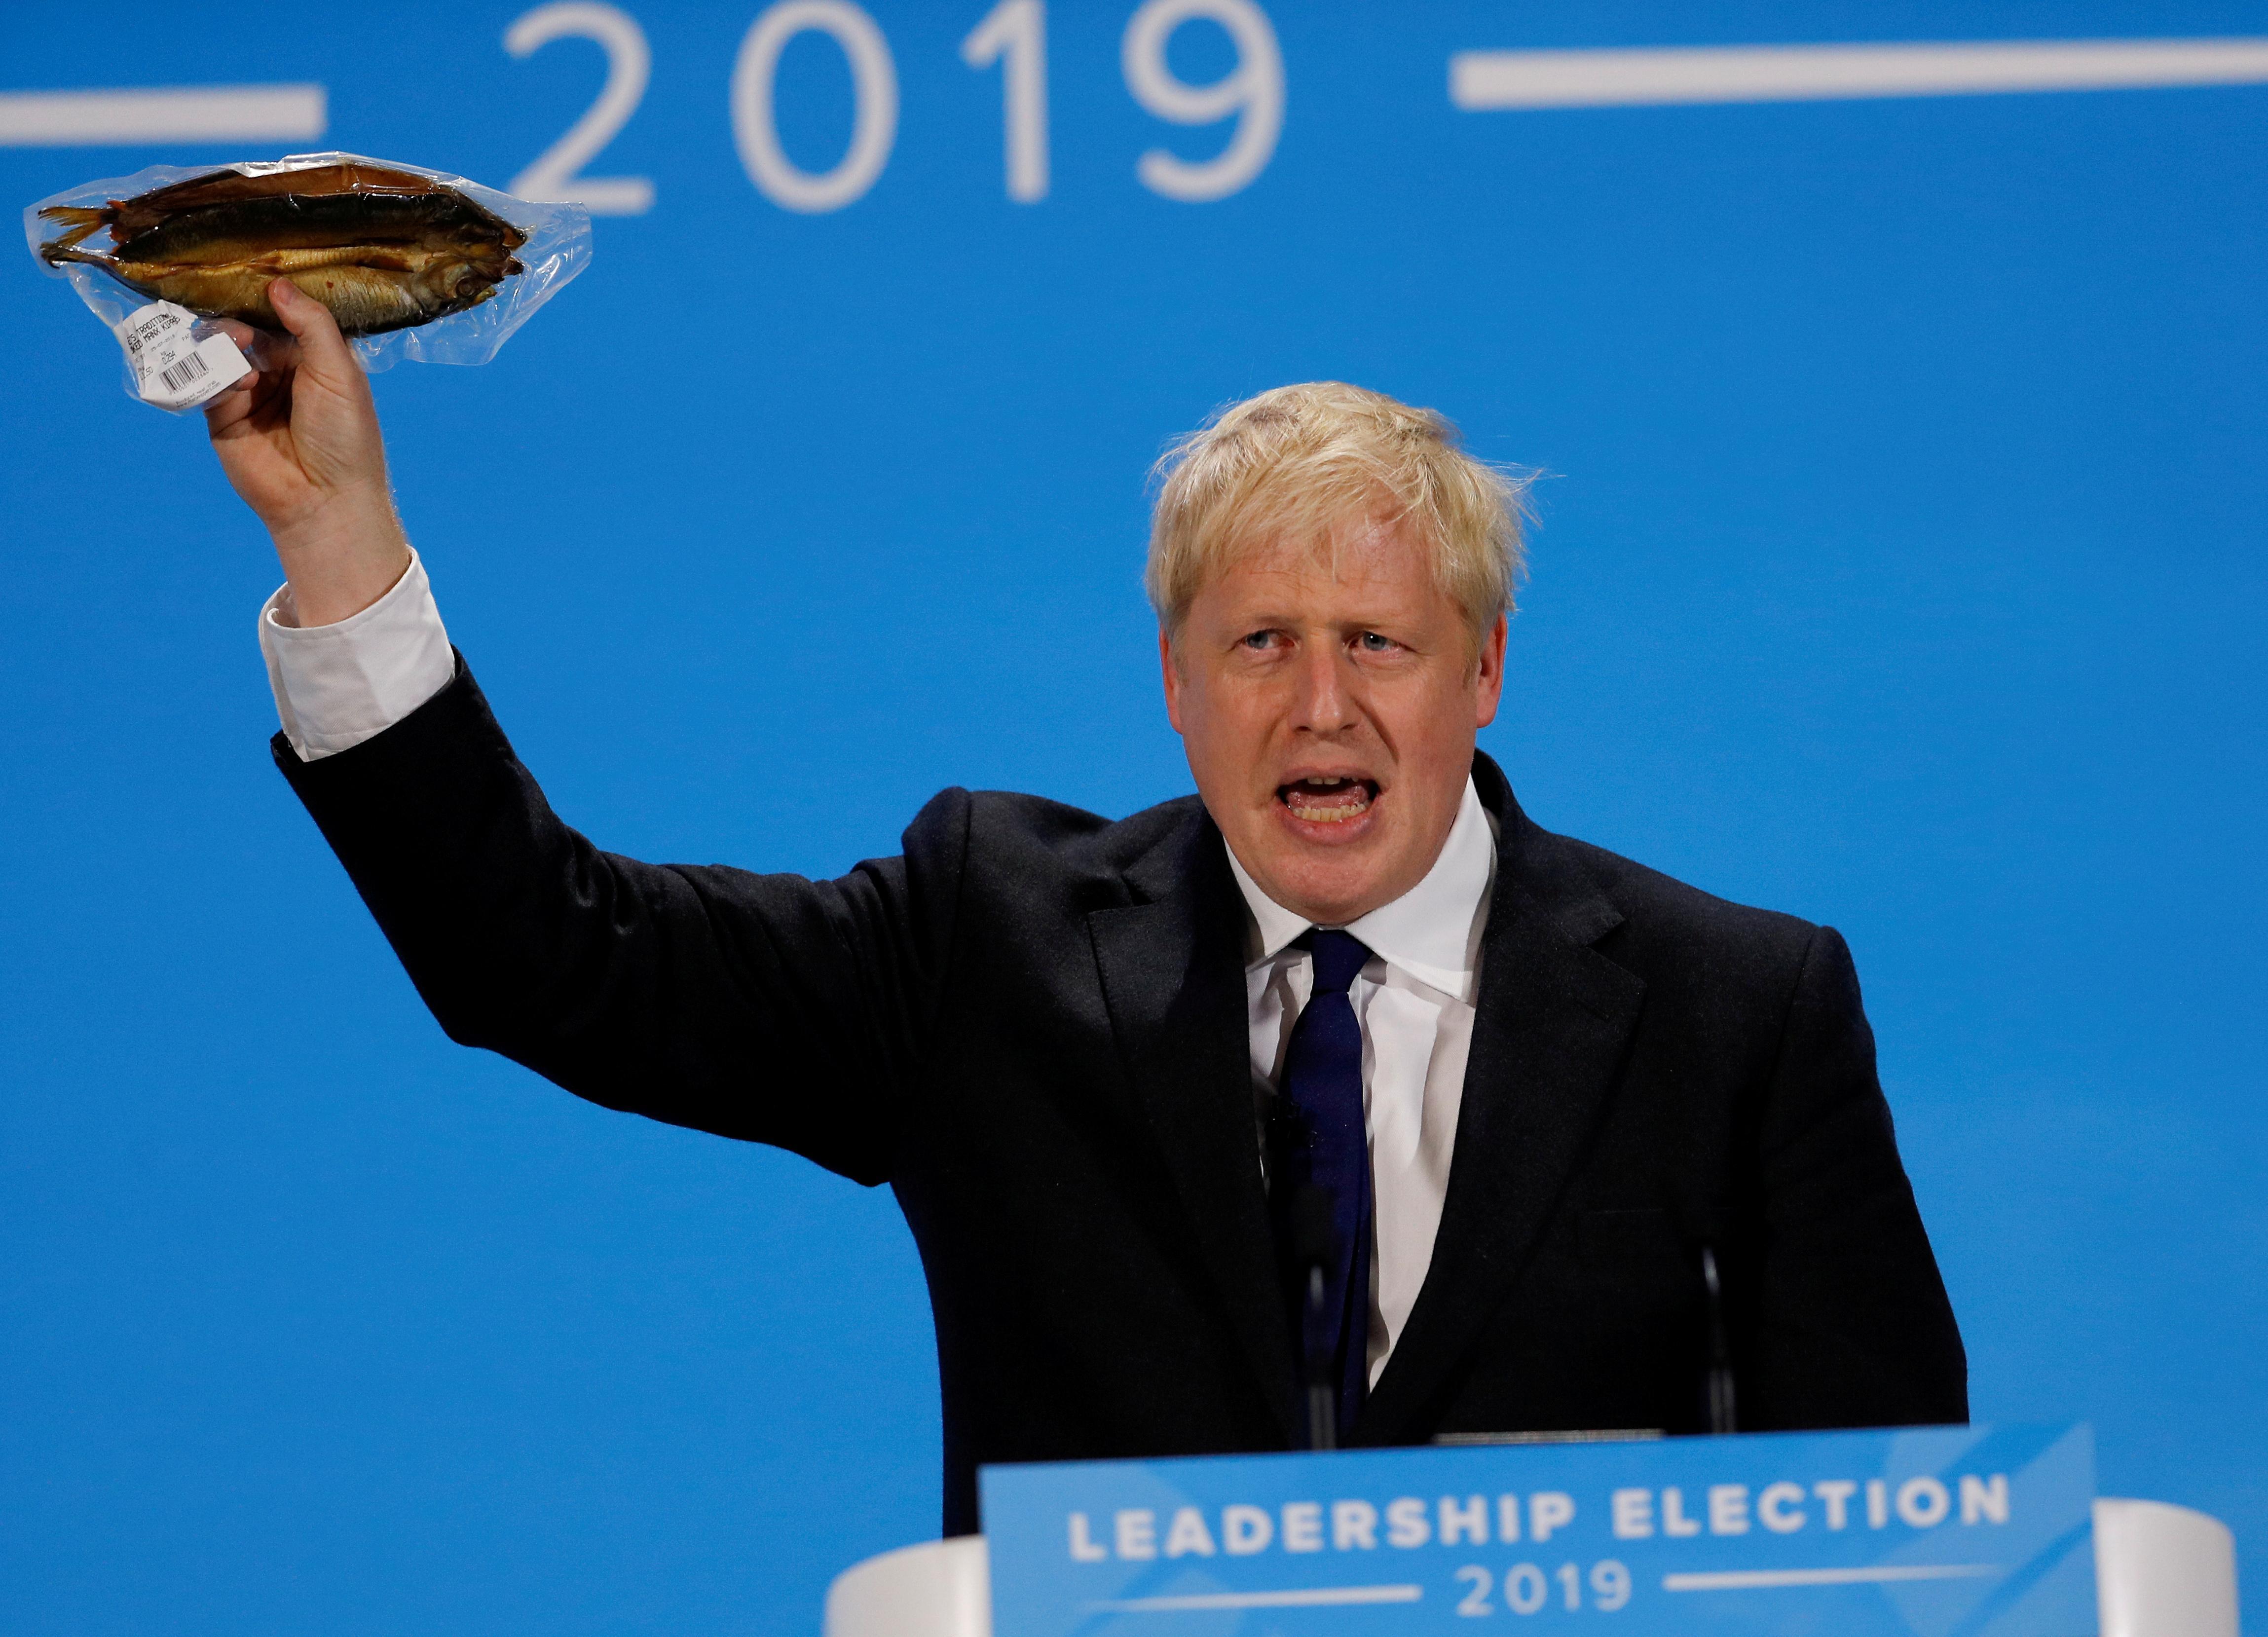 Boris Johnson's magniloquent tongue reaps political gold, linguists say